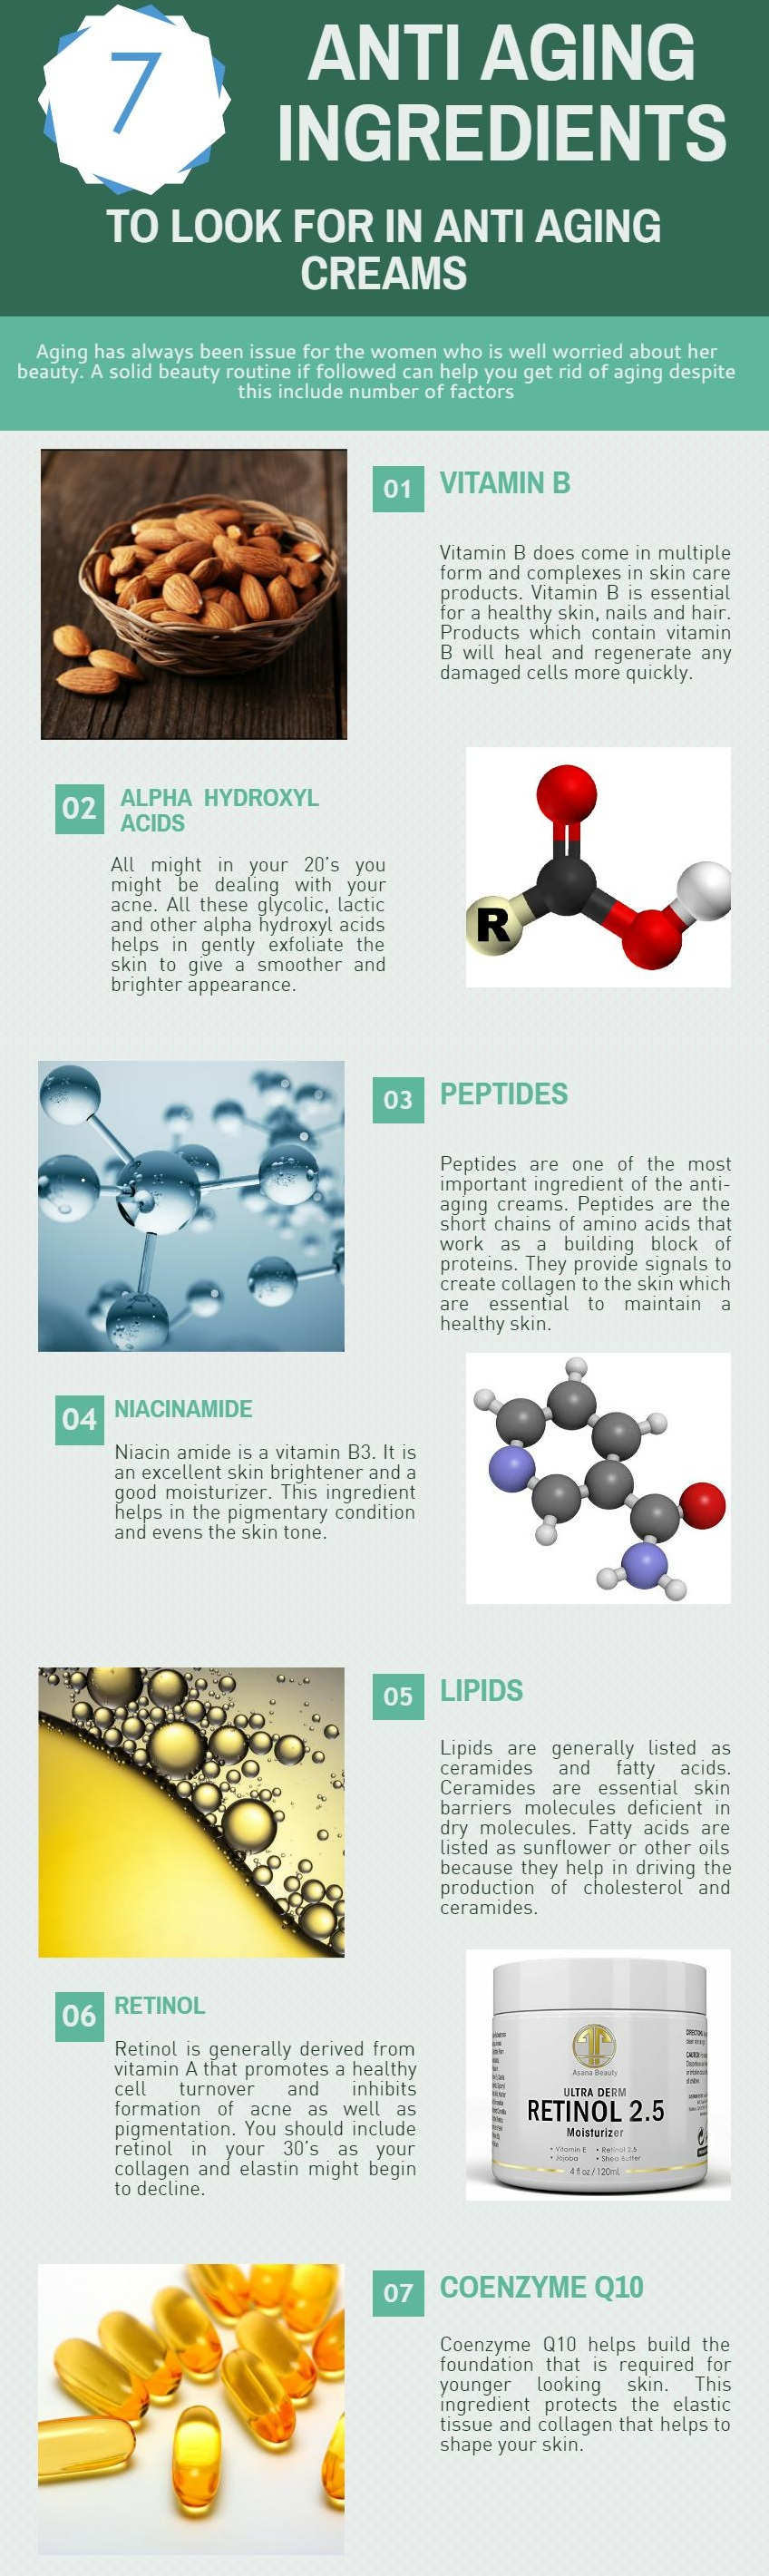 anti aging ingredients infographic